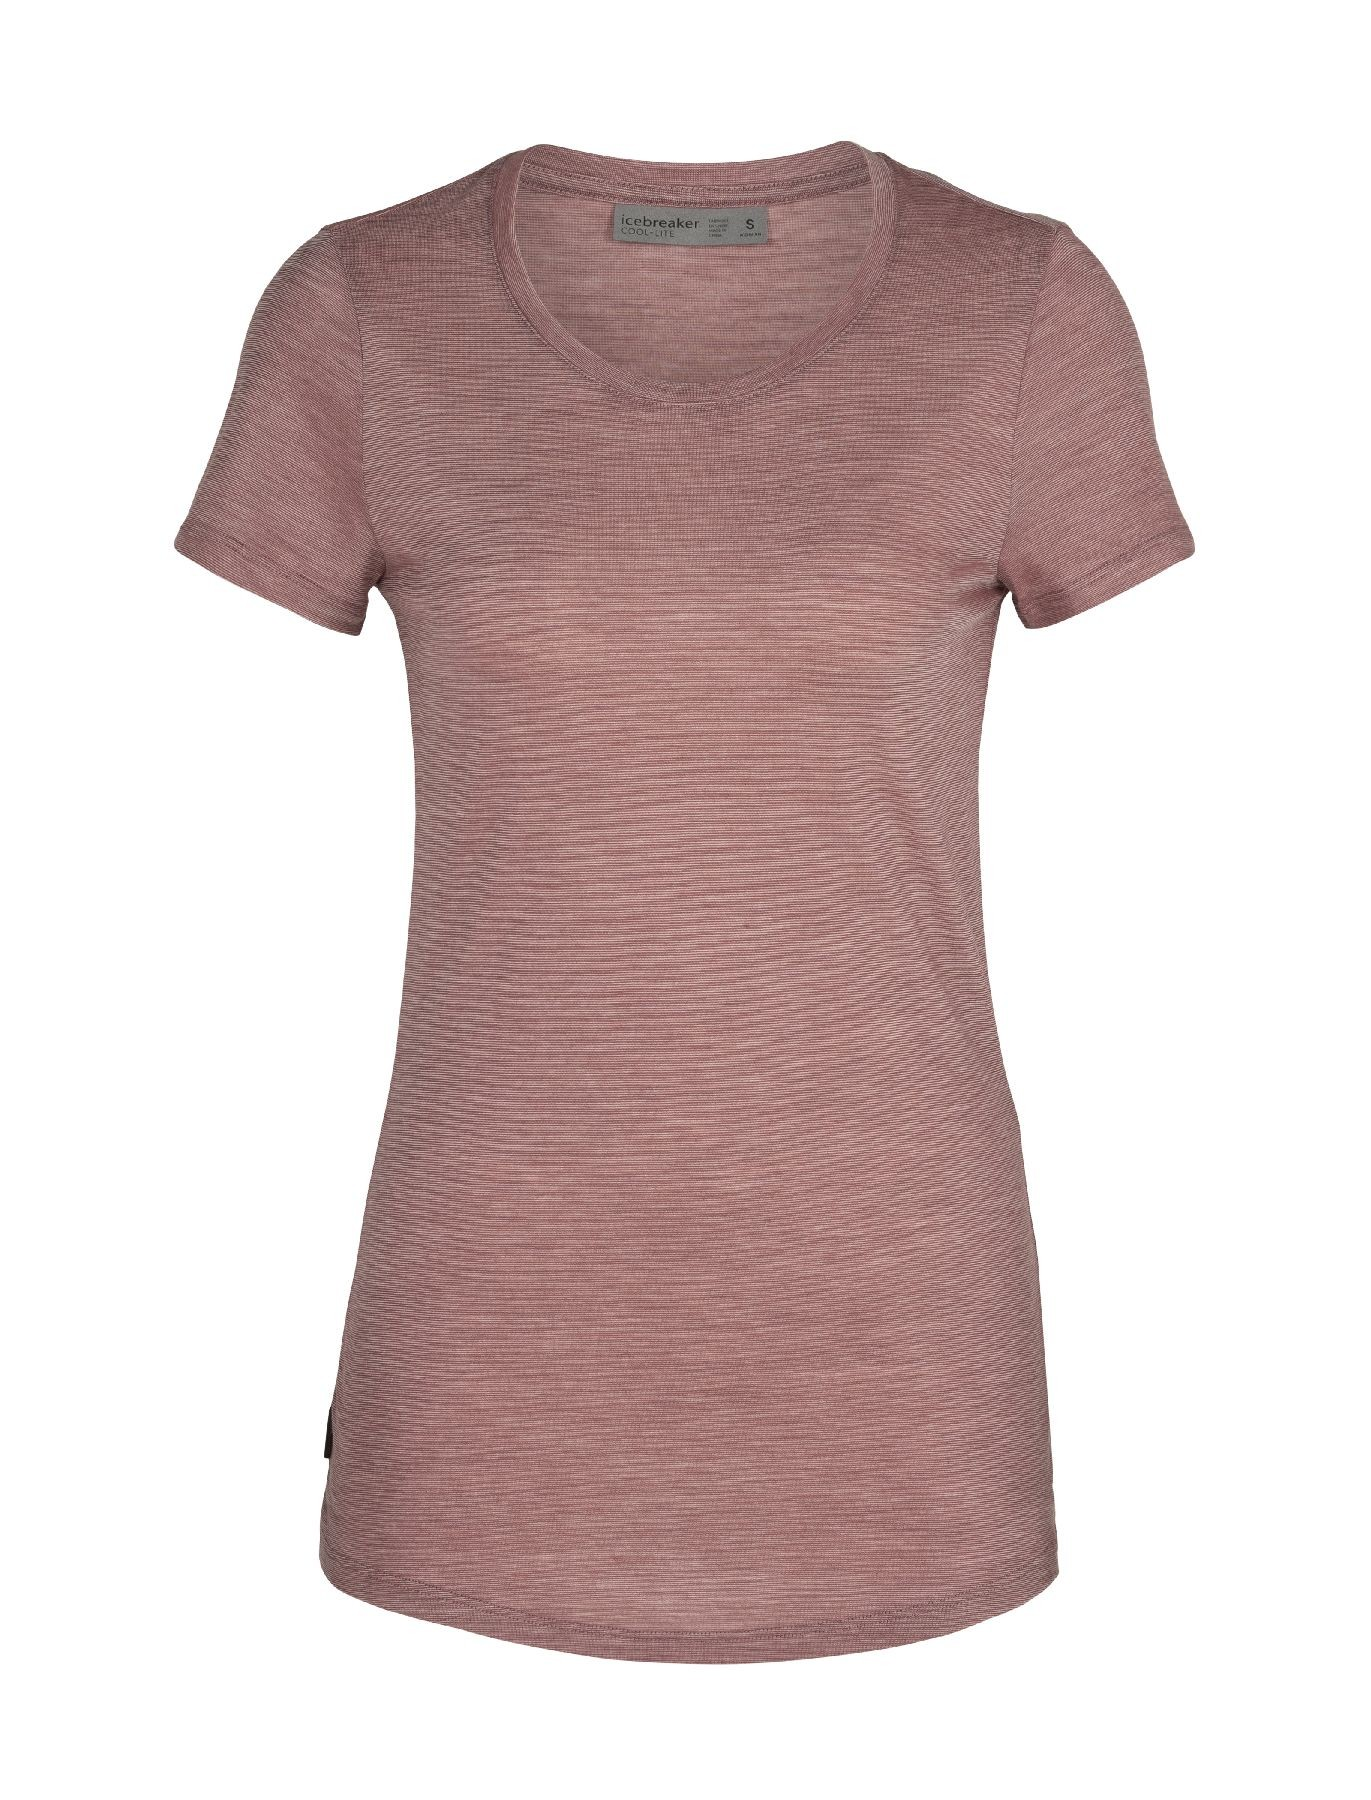 Icebreaker Cool-Lite Sphere Short Sleeve Low Crewe - T-shirt - Women's